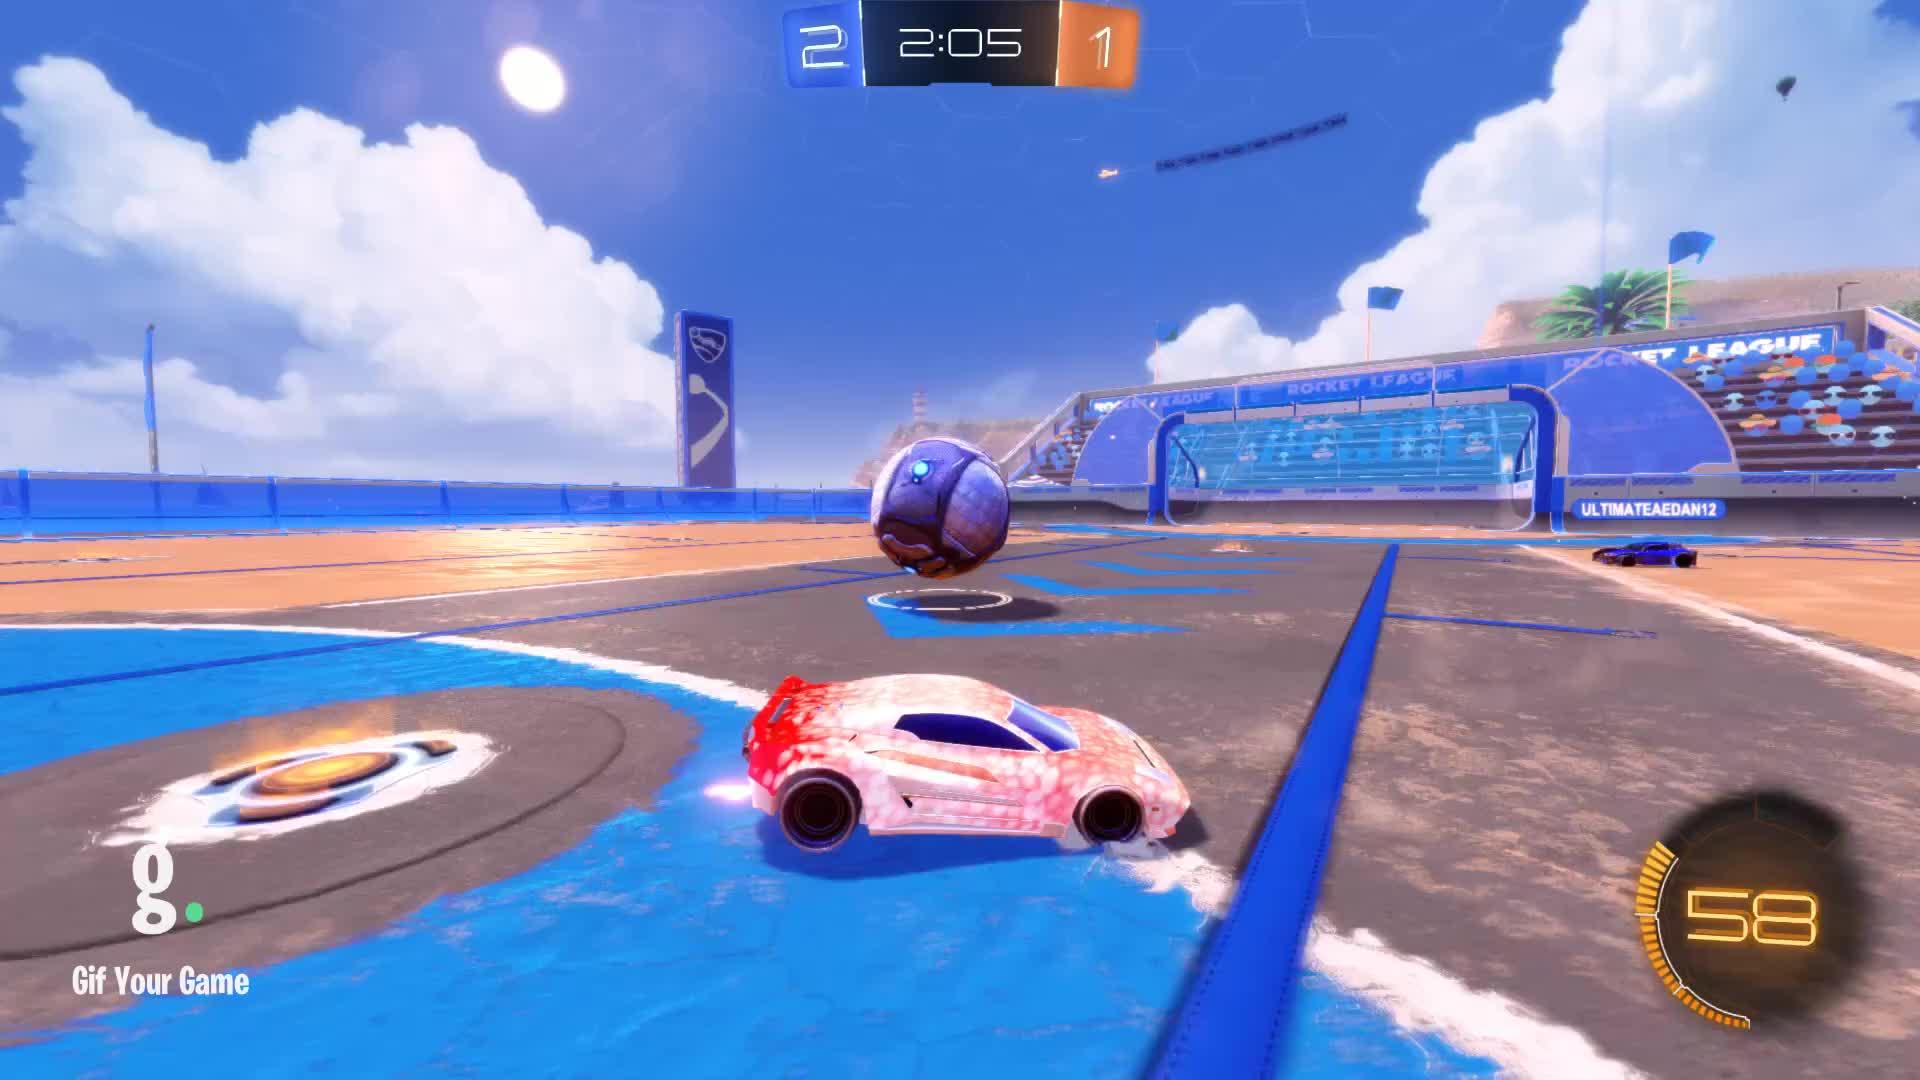 EnZedd, Gif Your Game, GifYourGame, Goal, Rocket League, RocketLeague, Goal 4: EnZedd GIFs